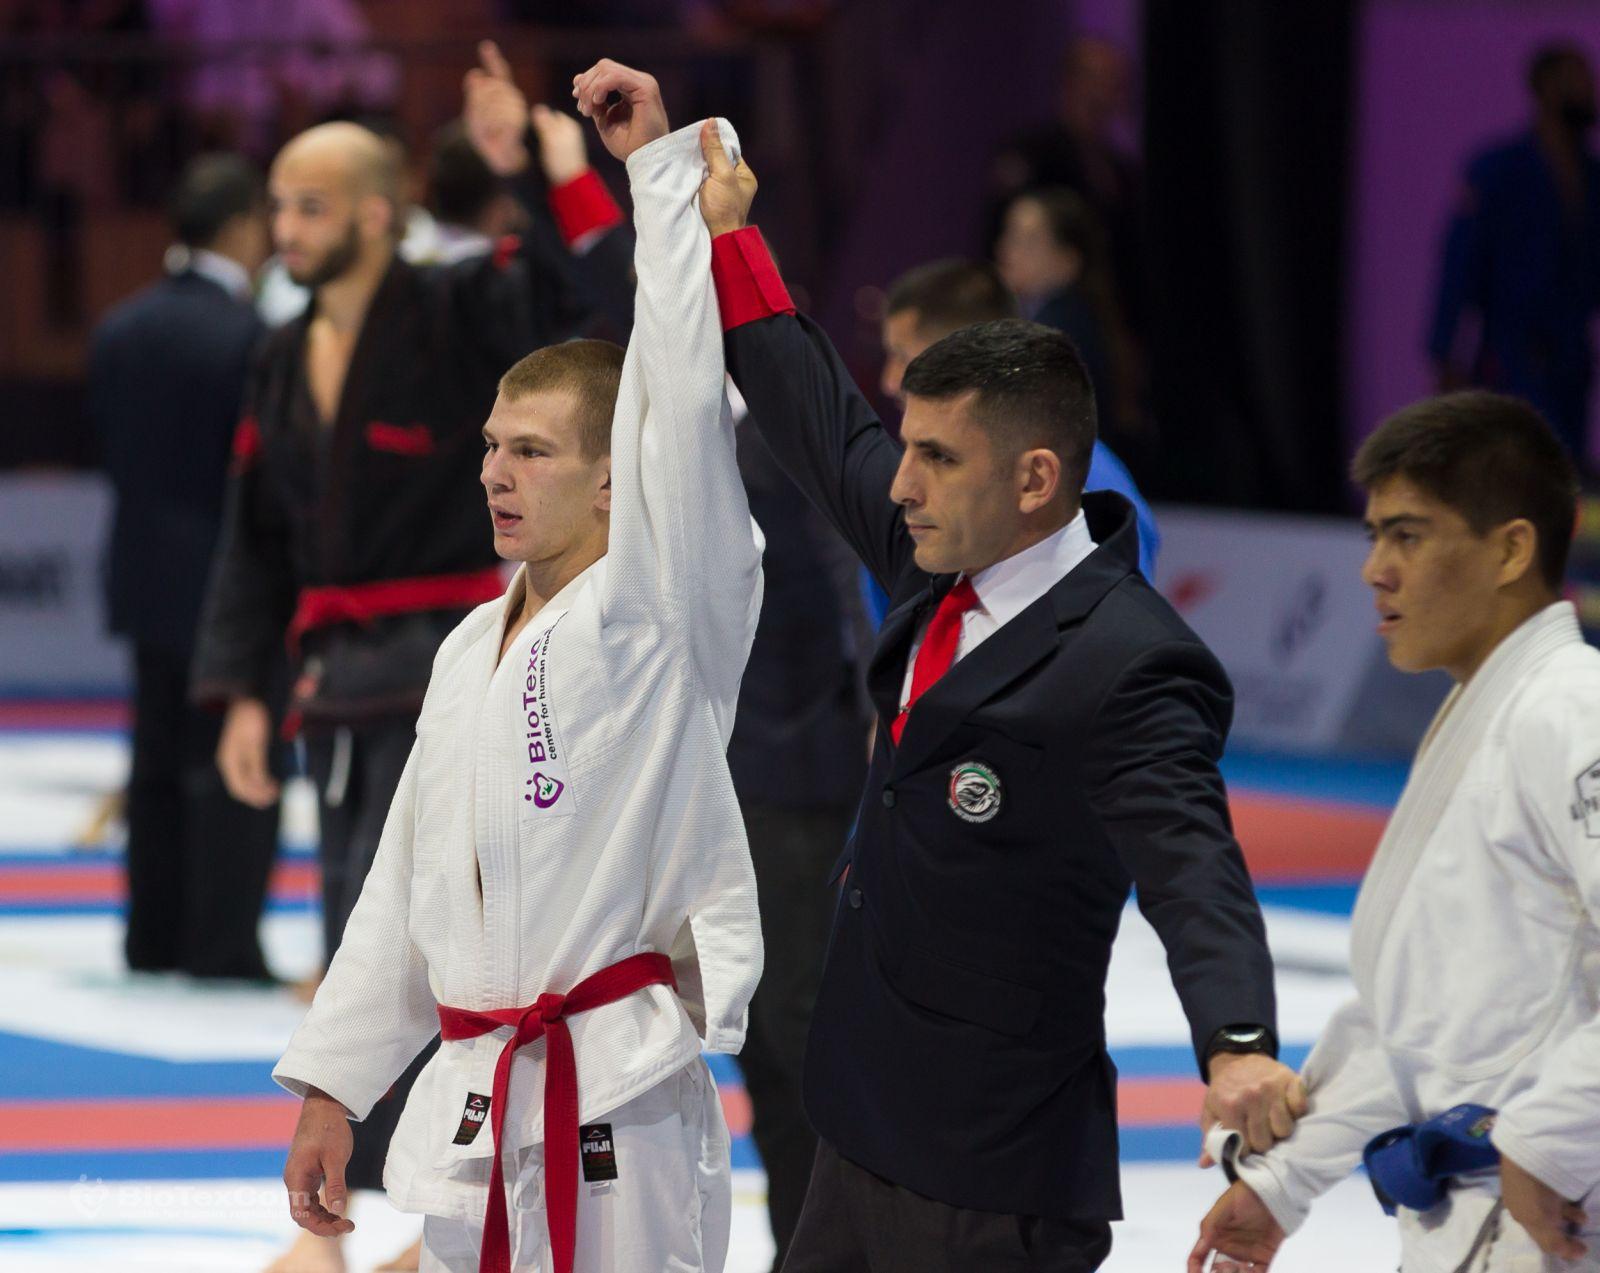 blazhko-yaroslav_Abu-Dhabi-World-Championship-2017-2_33